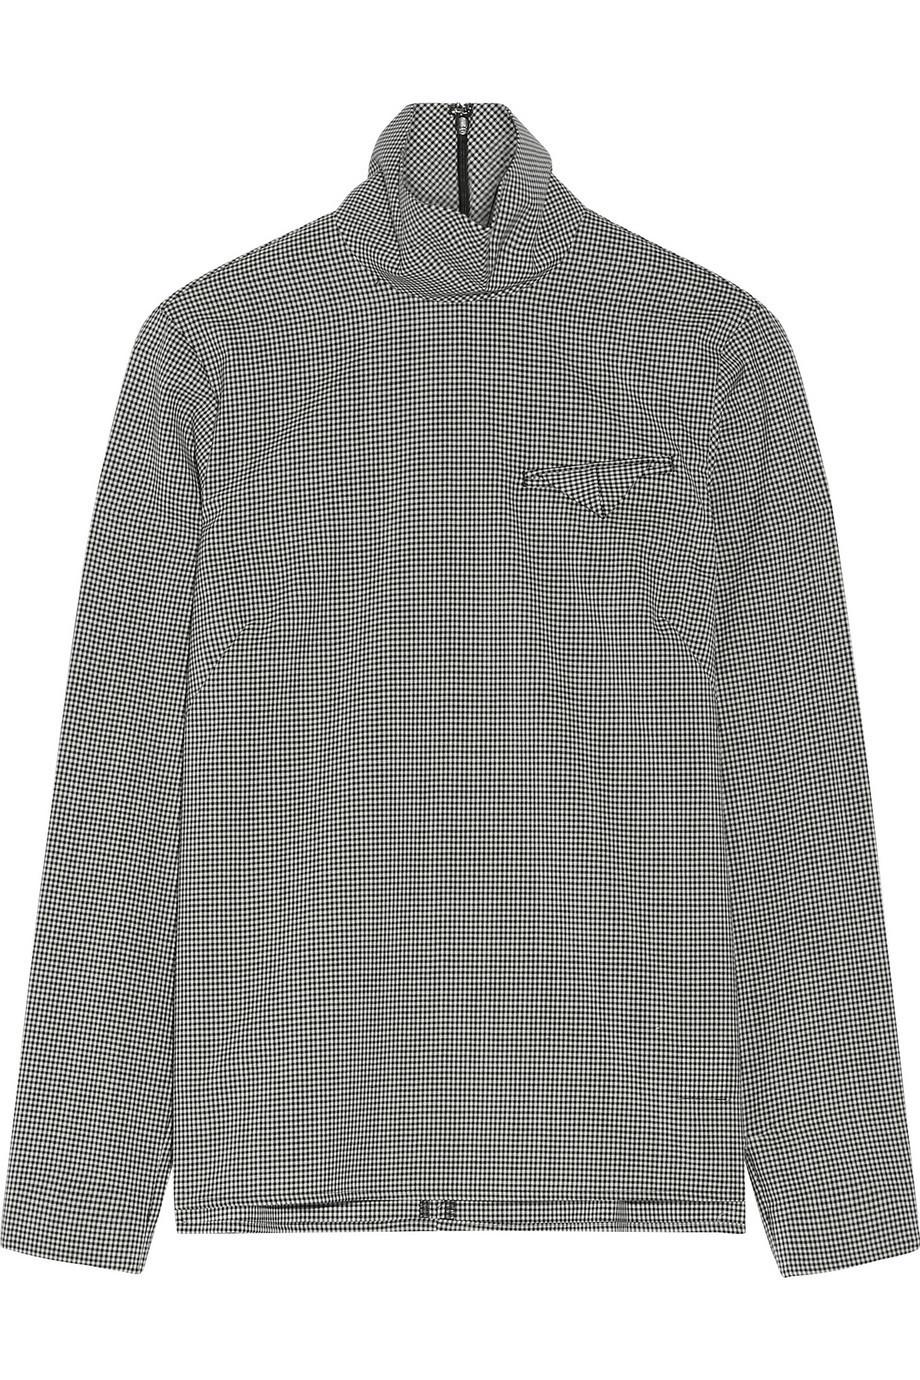 Facetasm Gingham Wool Turtleneck Top in black